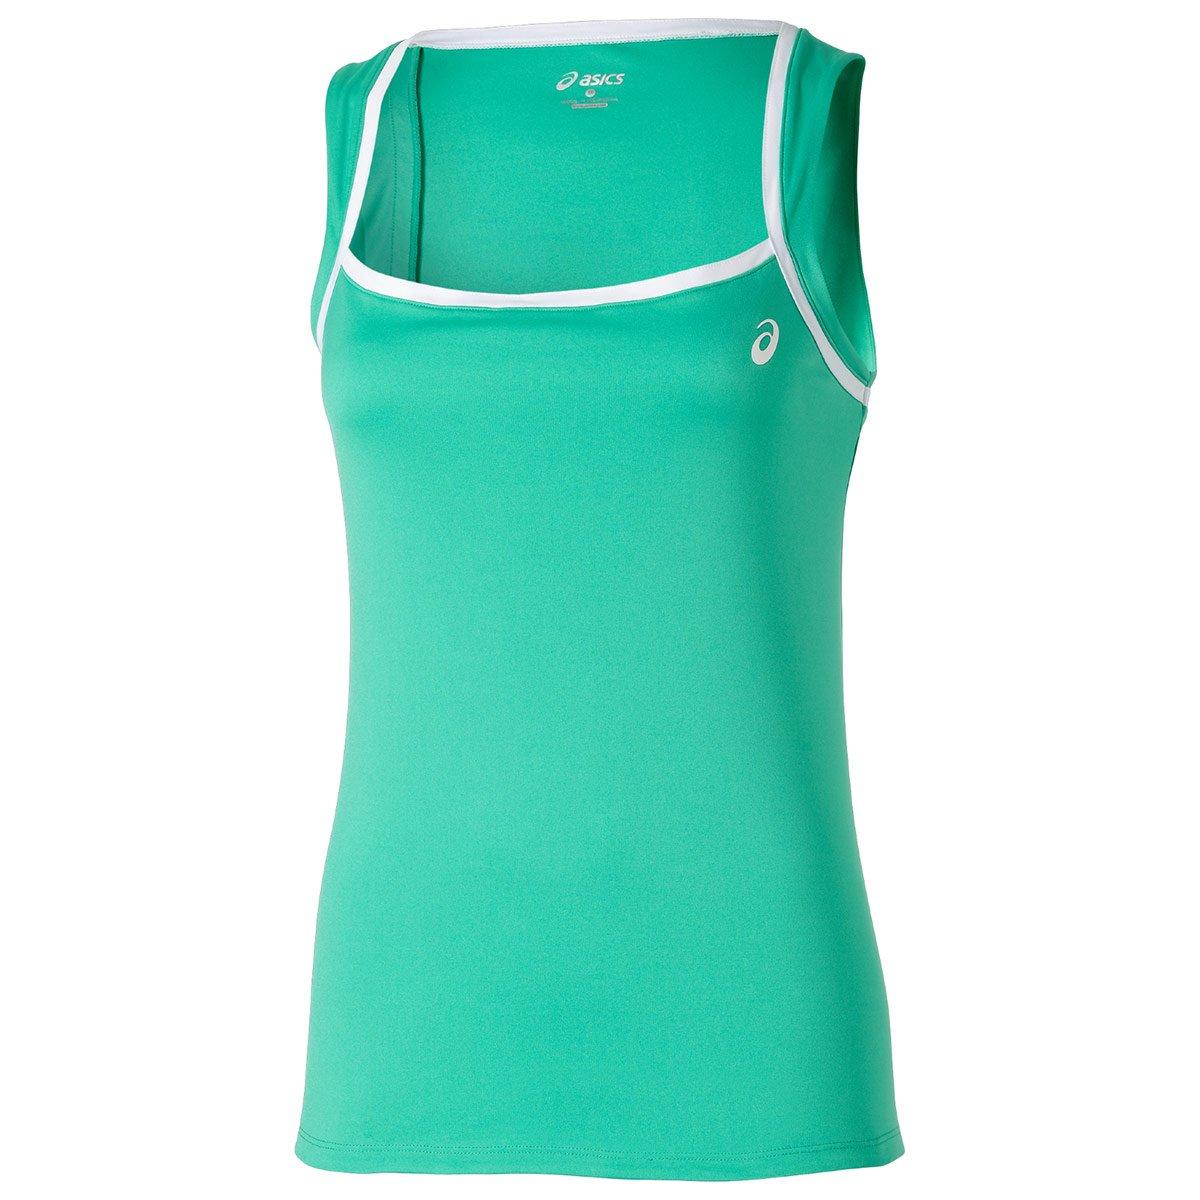 ASICS Camiseta Club Tank Top Verde: Amazon.es: Deportes y ...